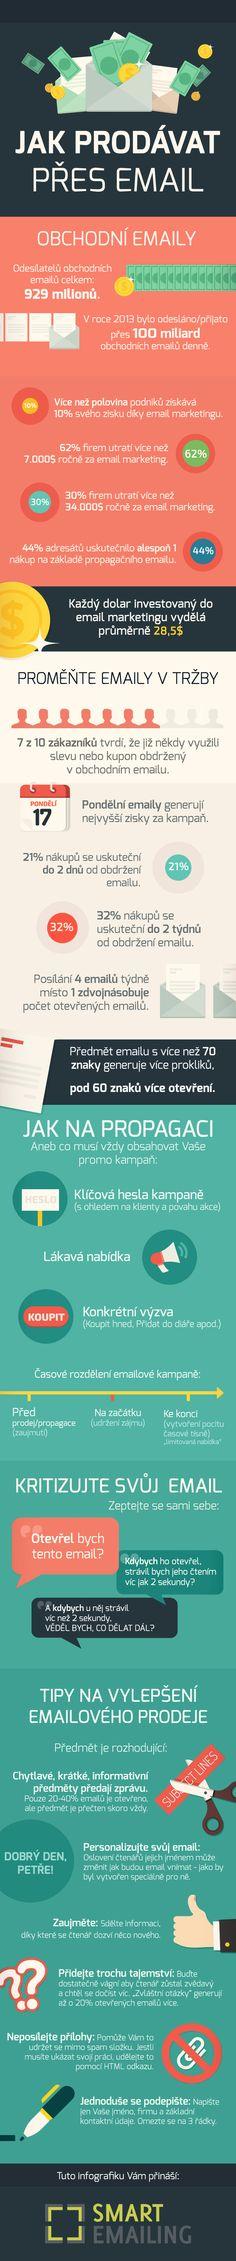 SE_infografika_JakProdavatPresEmail